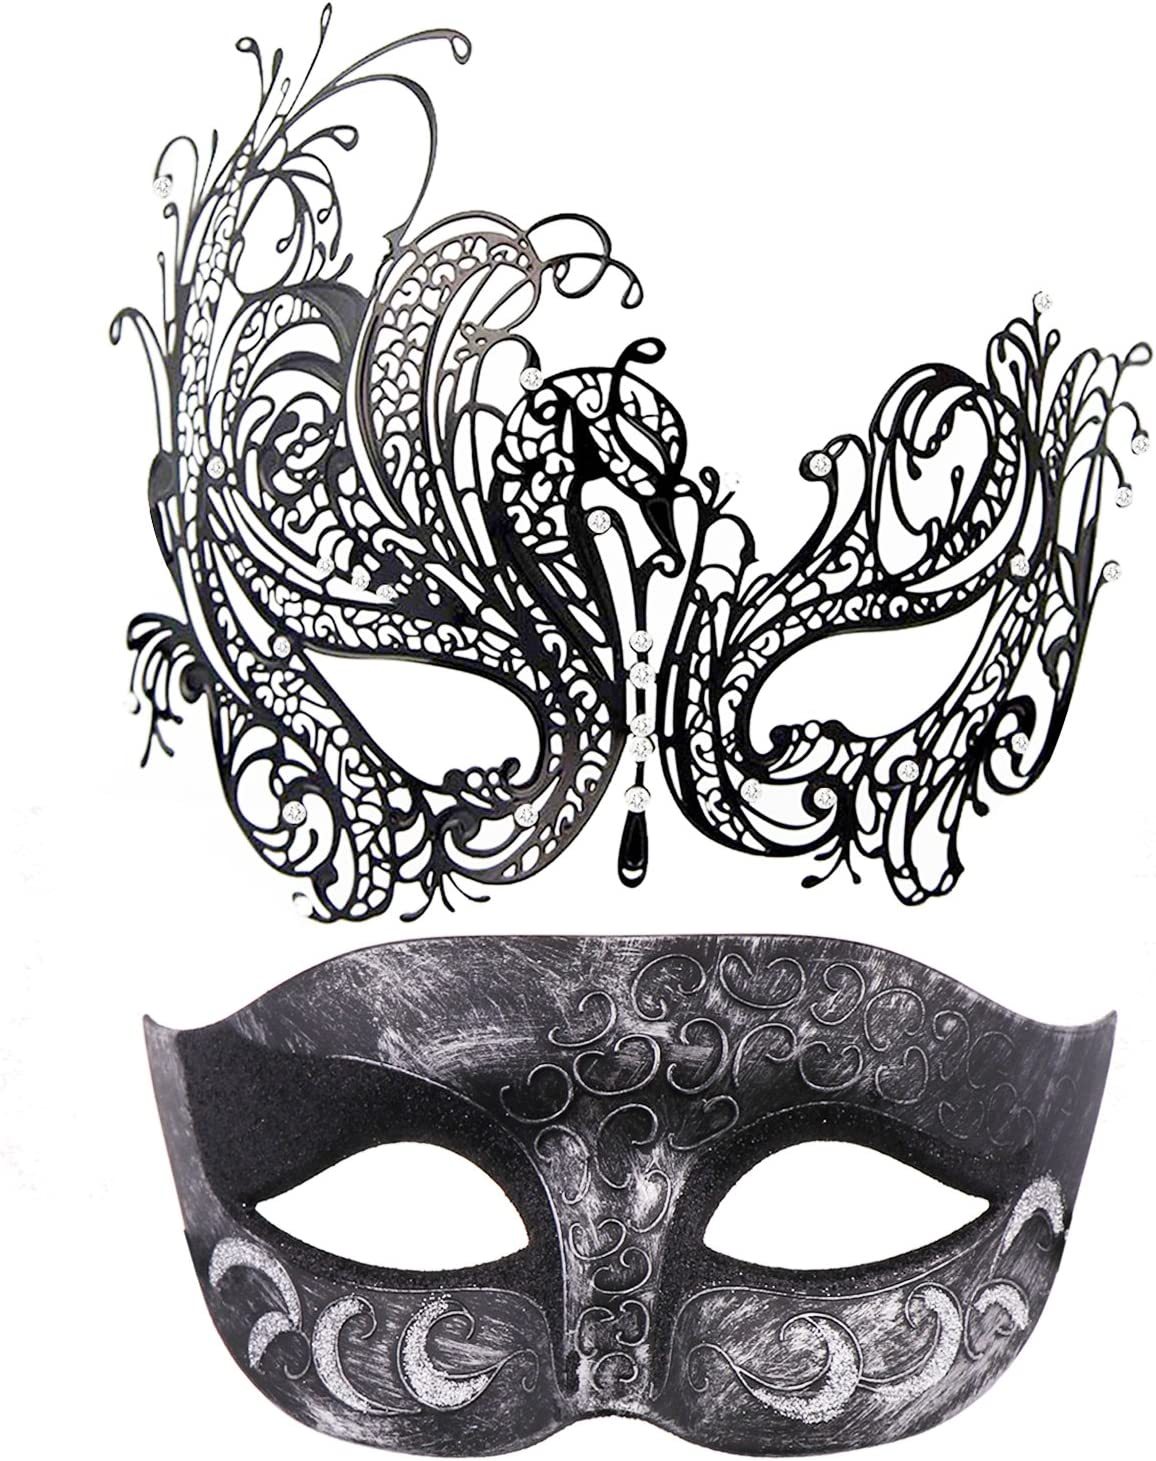 Black Lace Mardi Gras Festival Masquerade Burlesque Mask